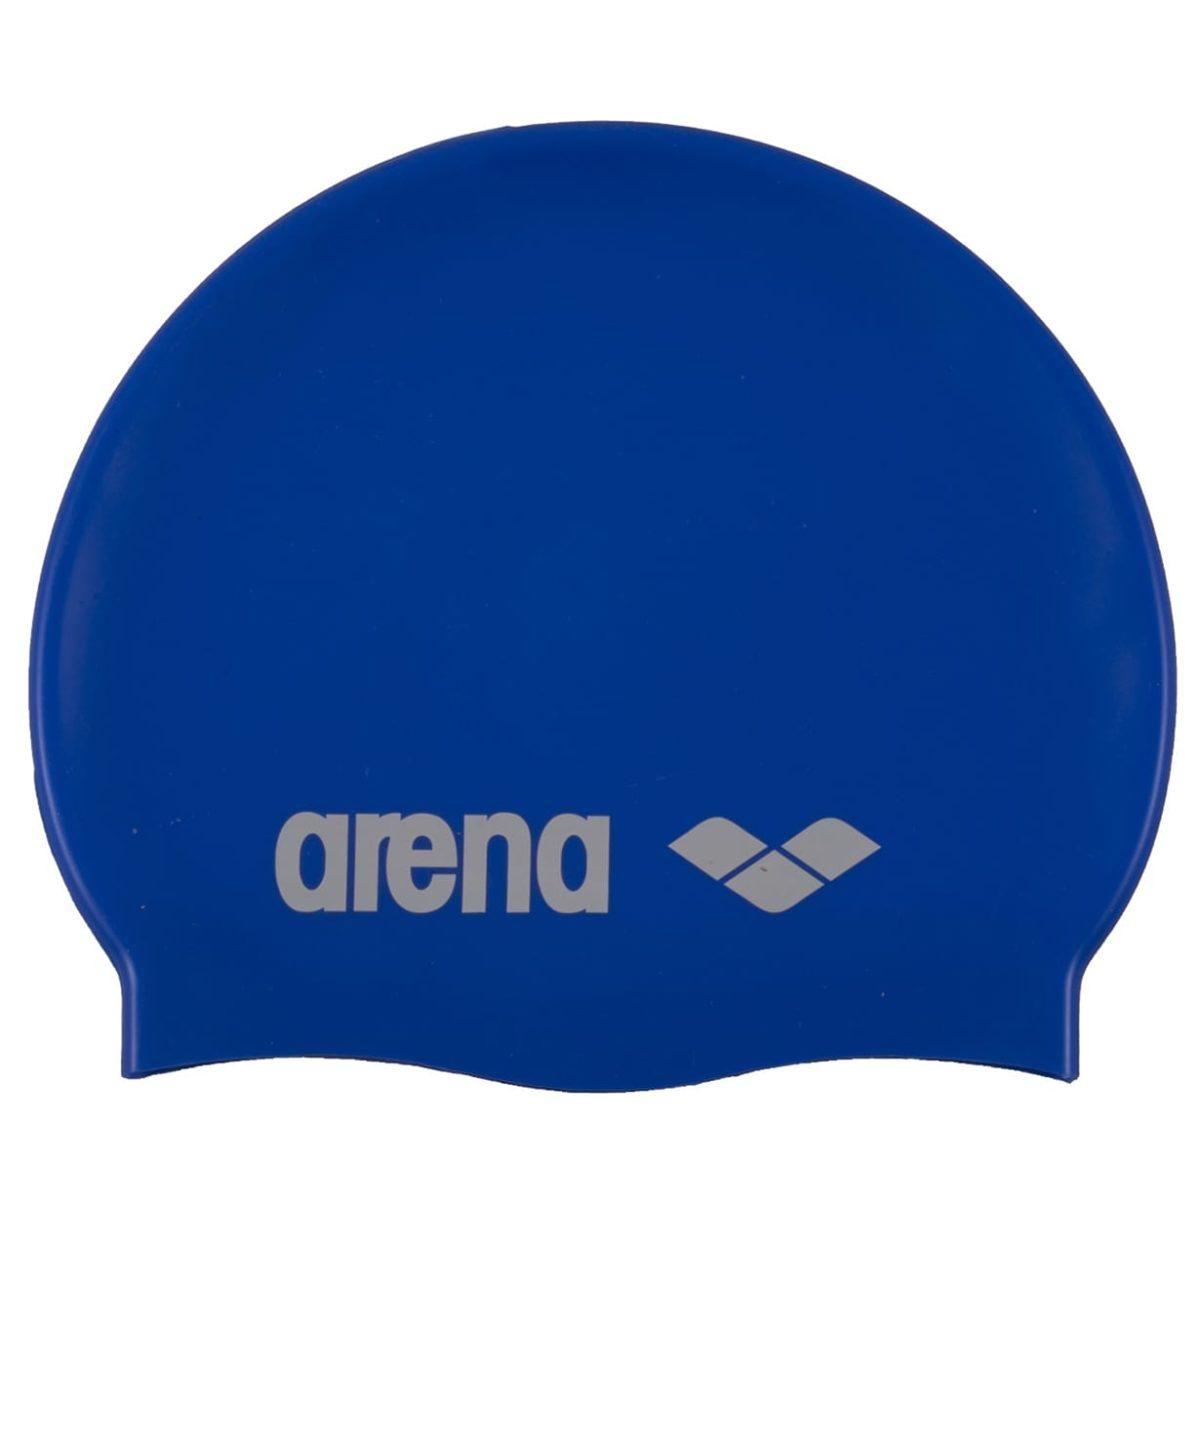 ARENA Classic Silicone Cap sky blue/white Шапочка для плавания  91662 77 - 1